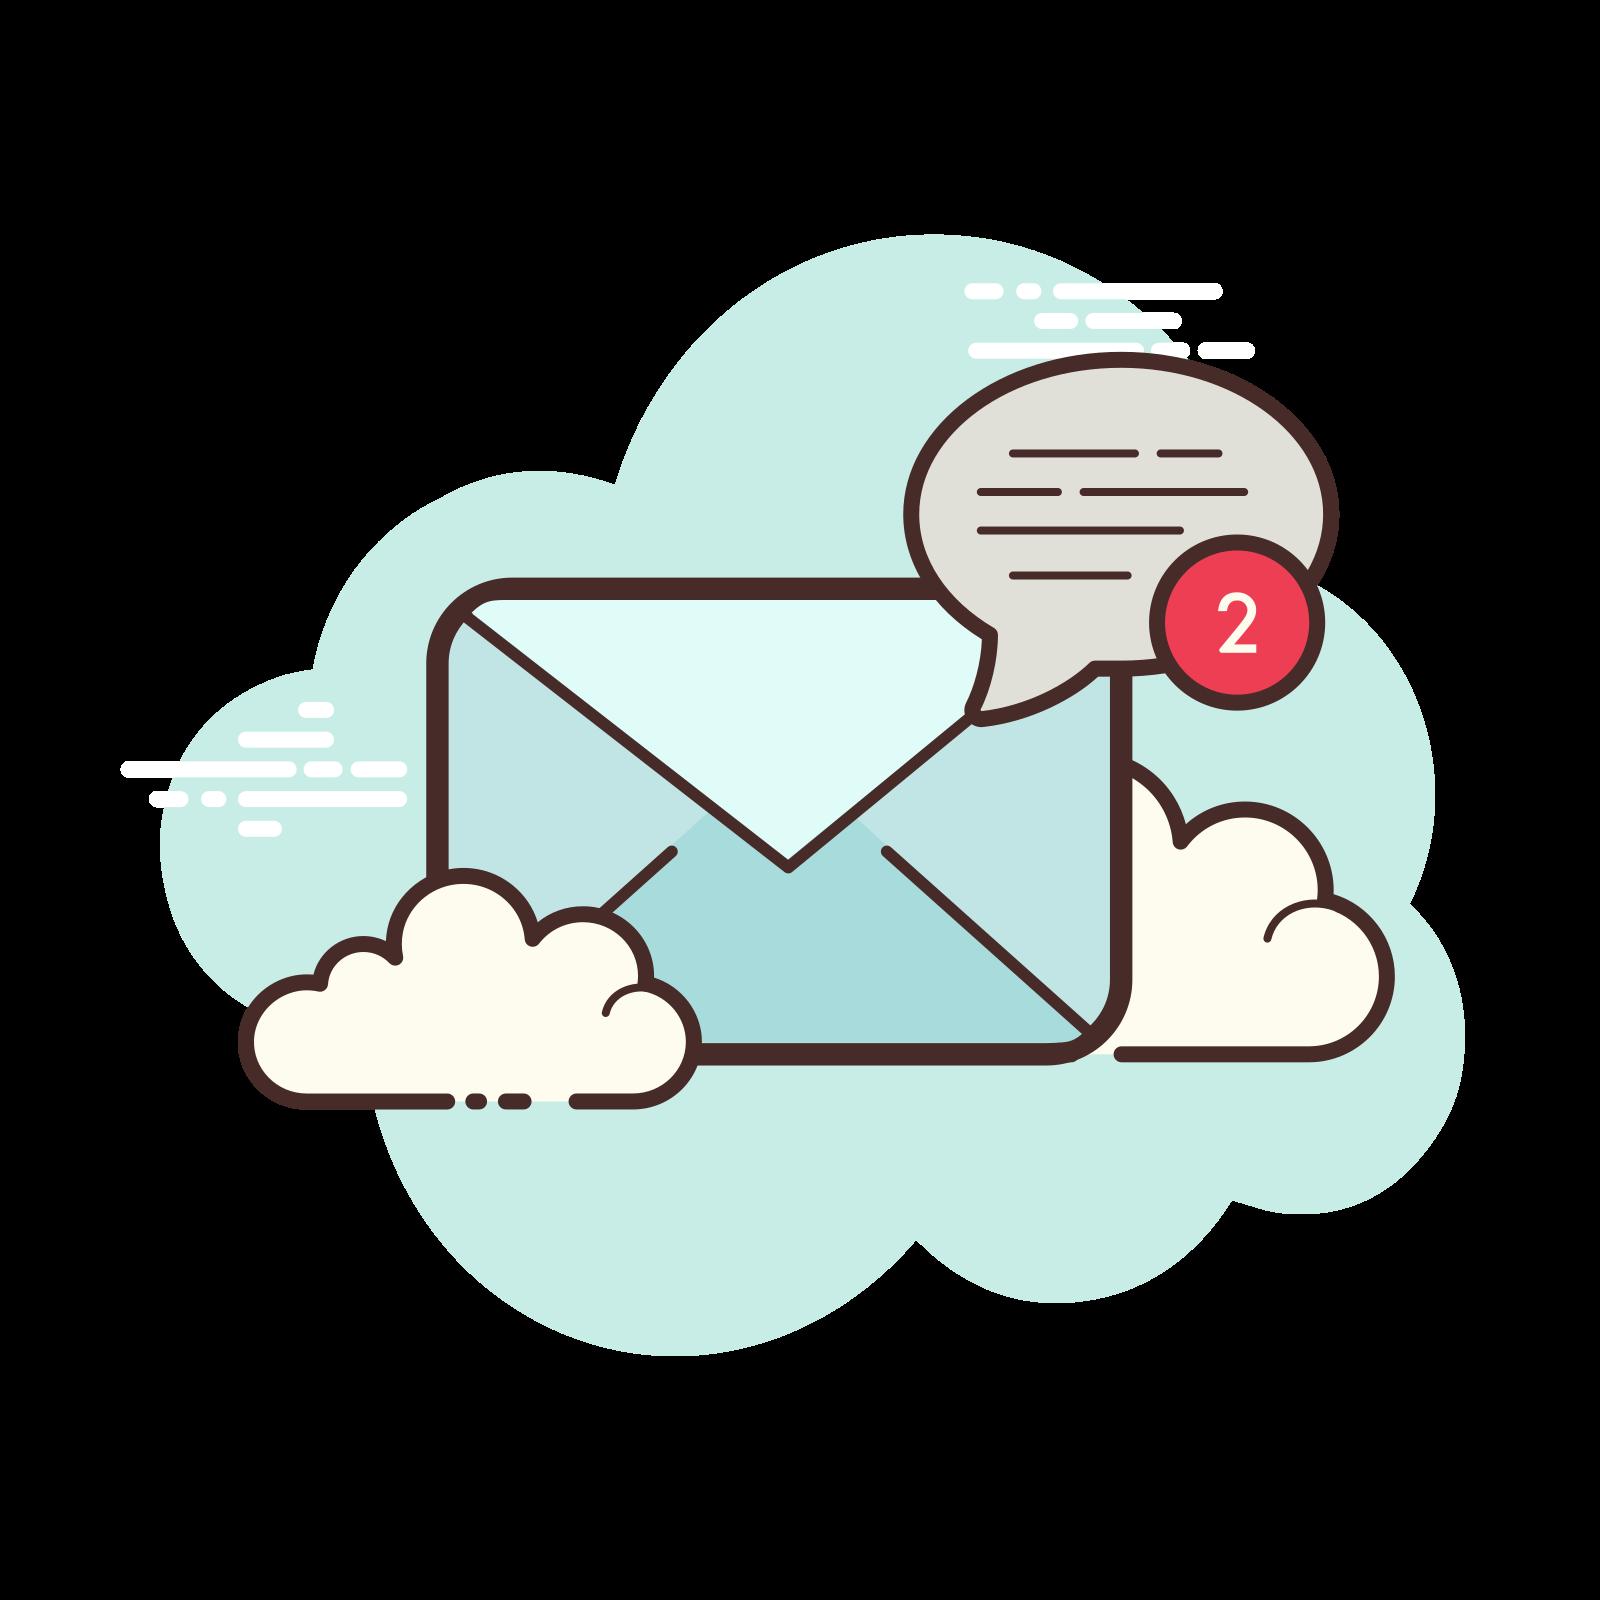 Full Mailbox icon